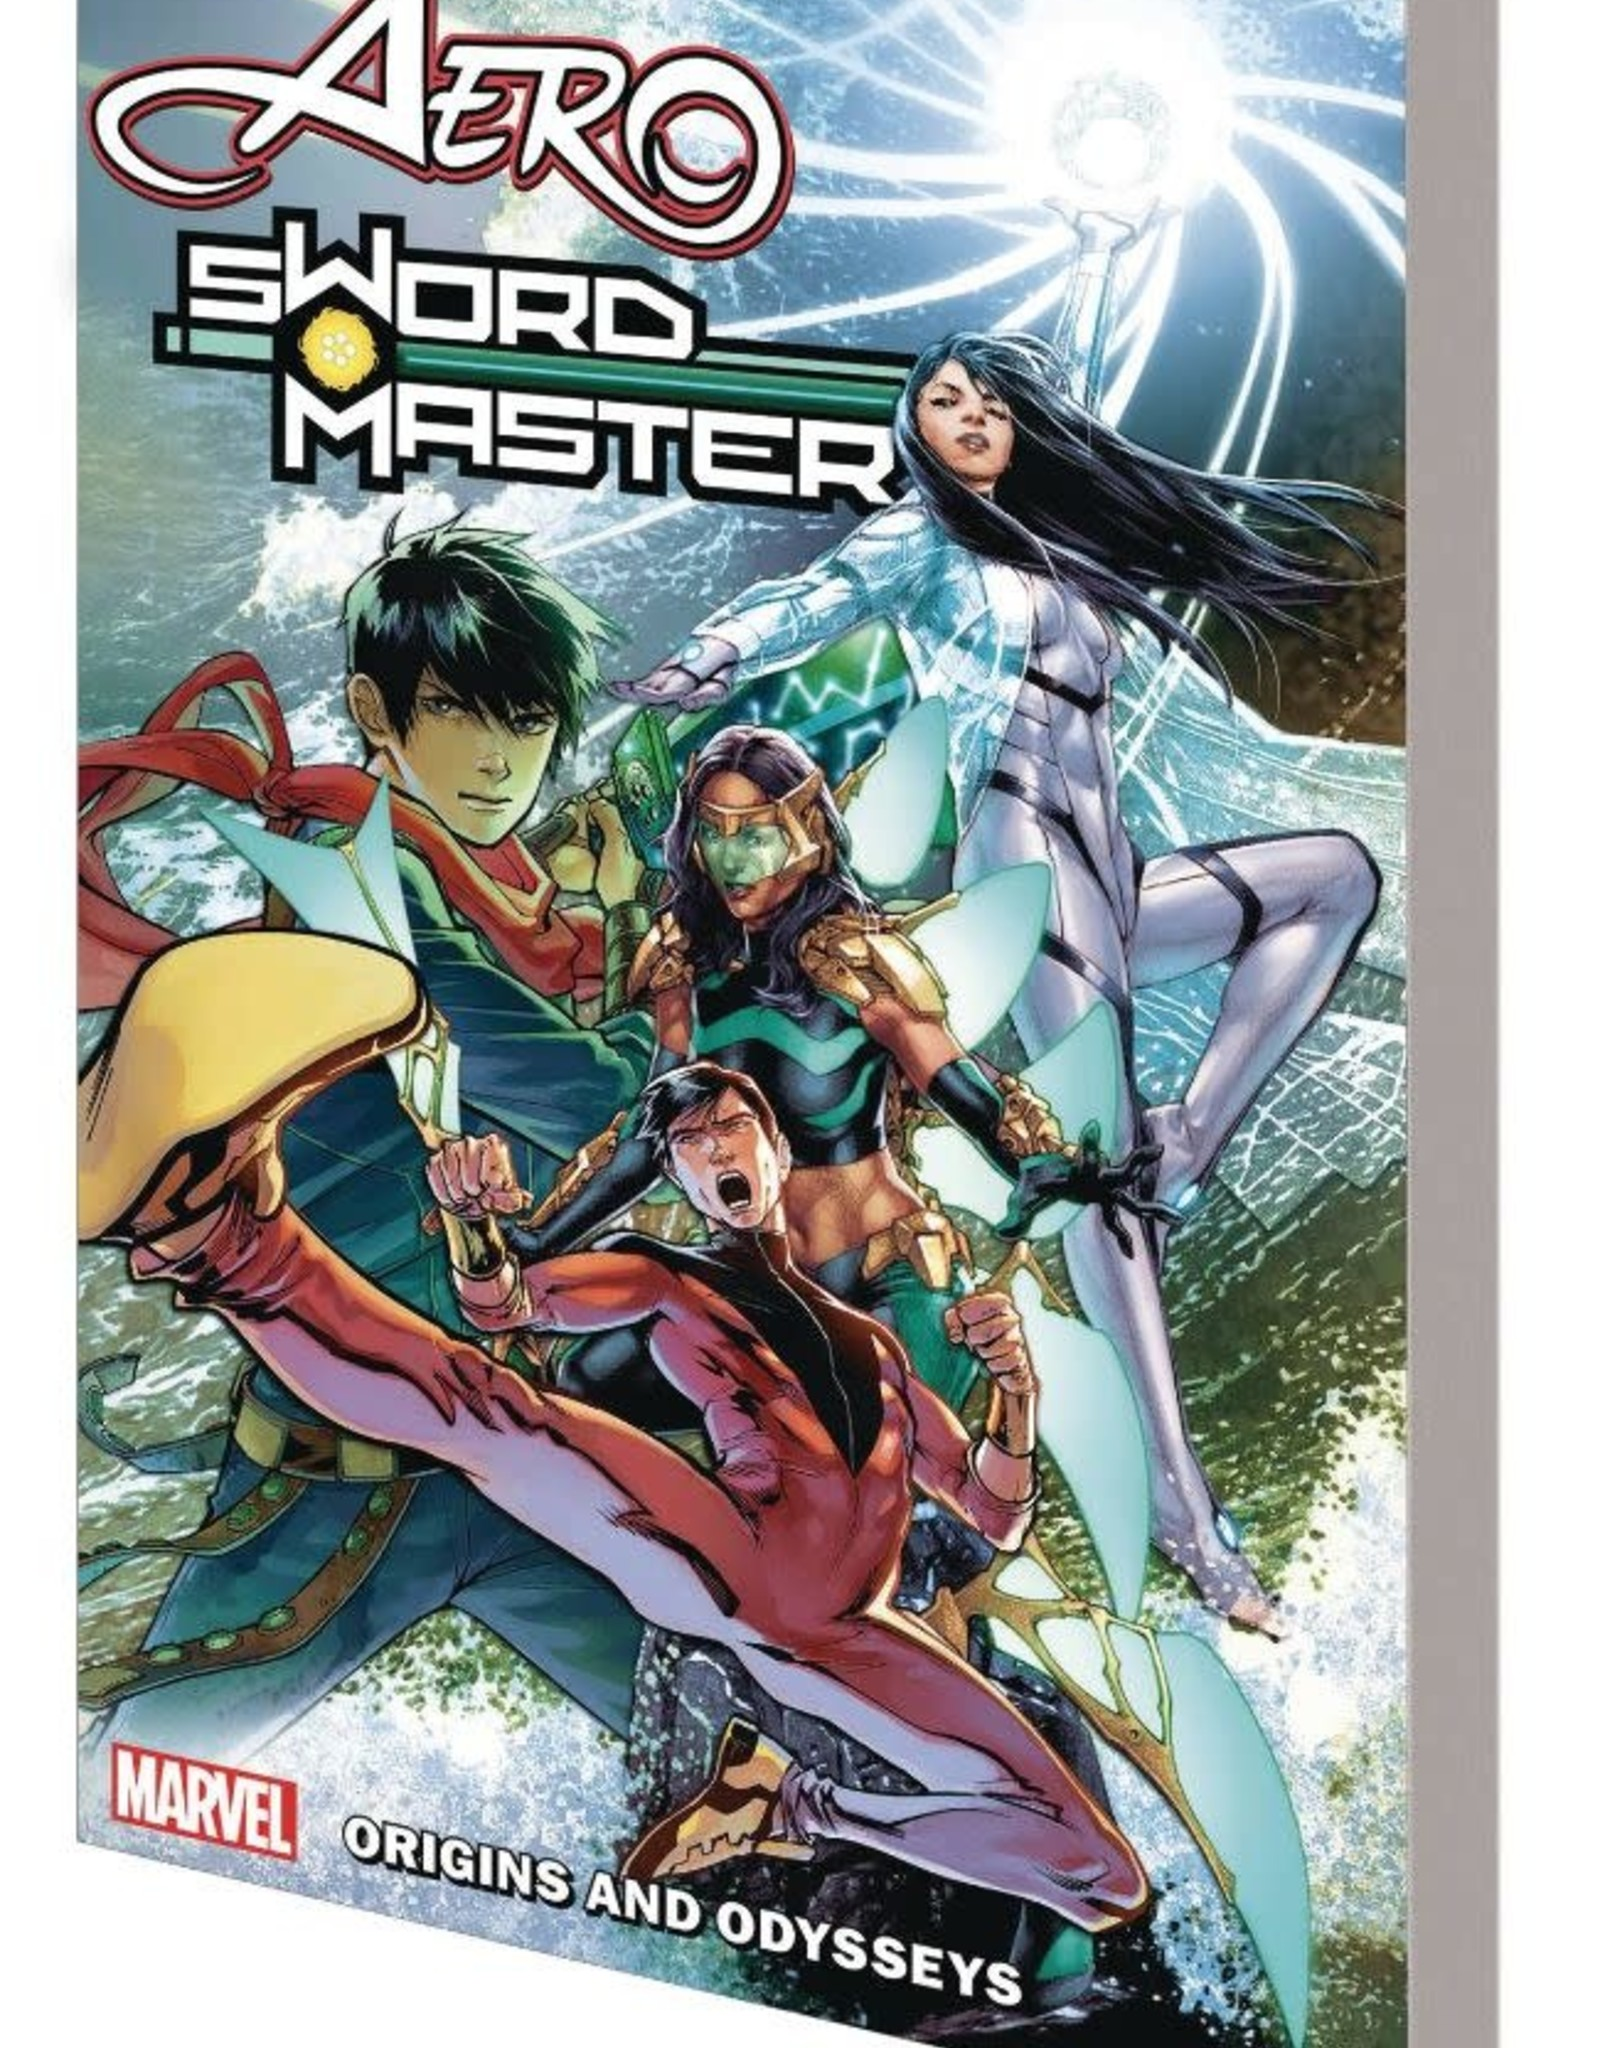 Marvel Comics Aero and Sword Master: Origins And Odysseys TP